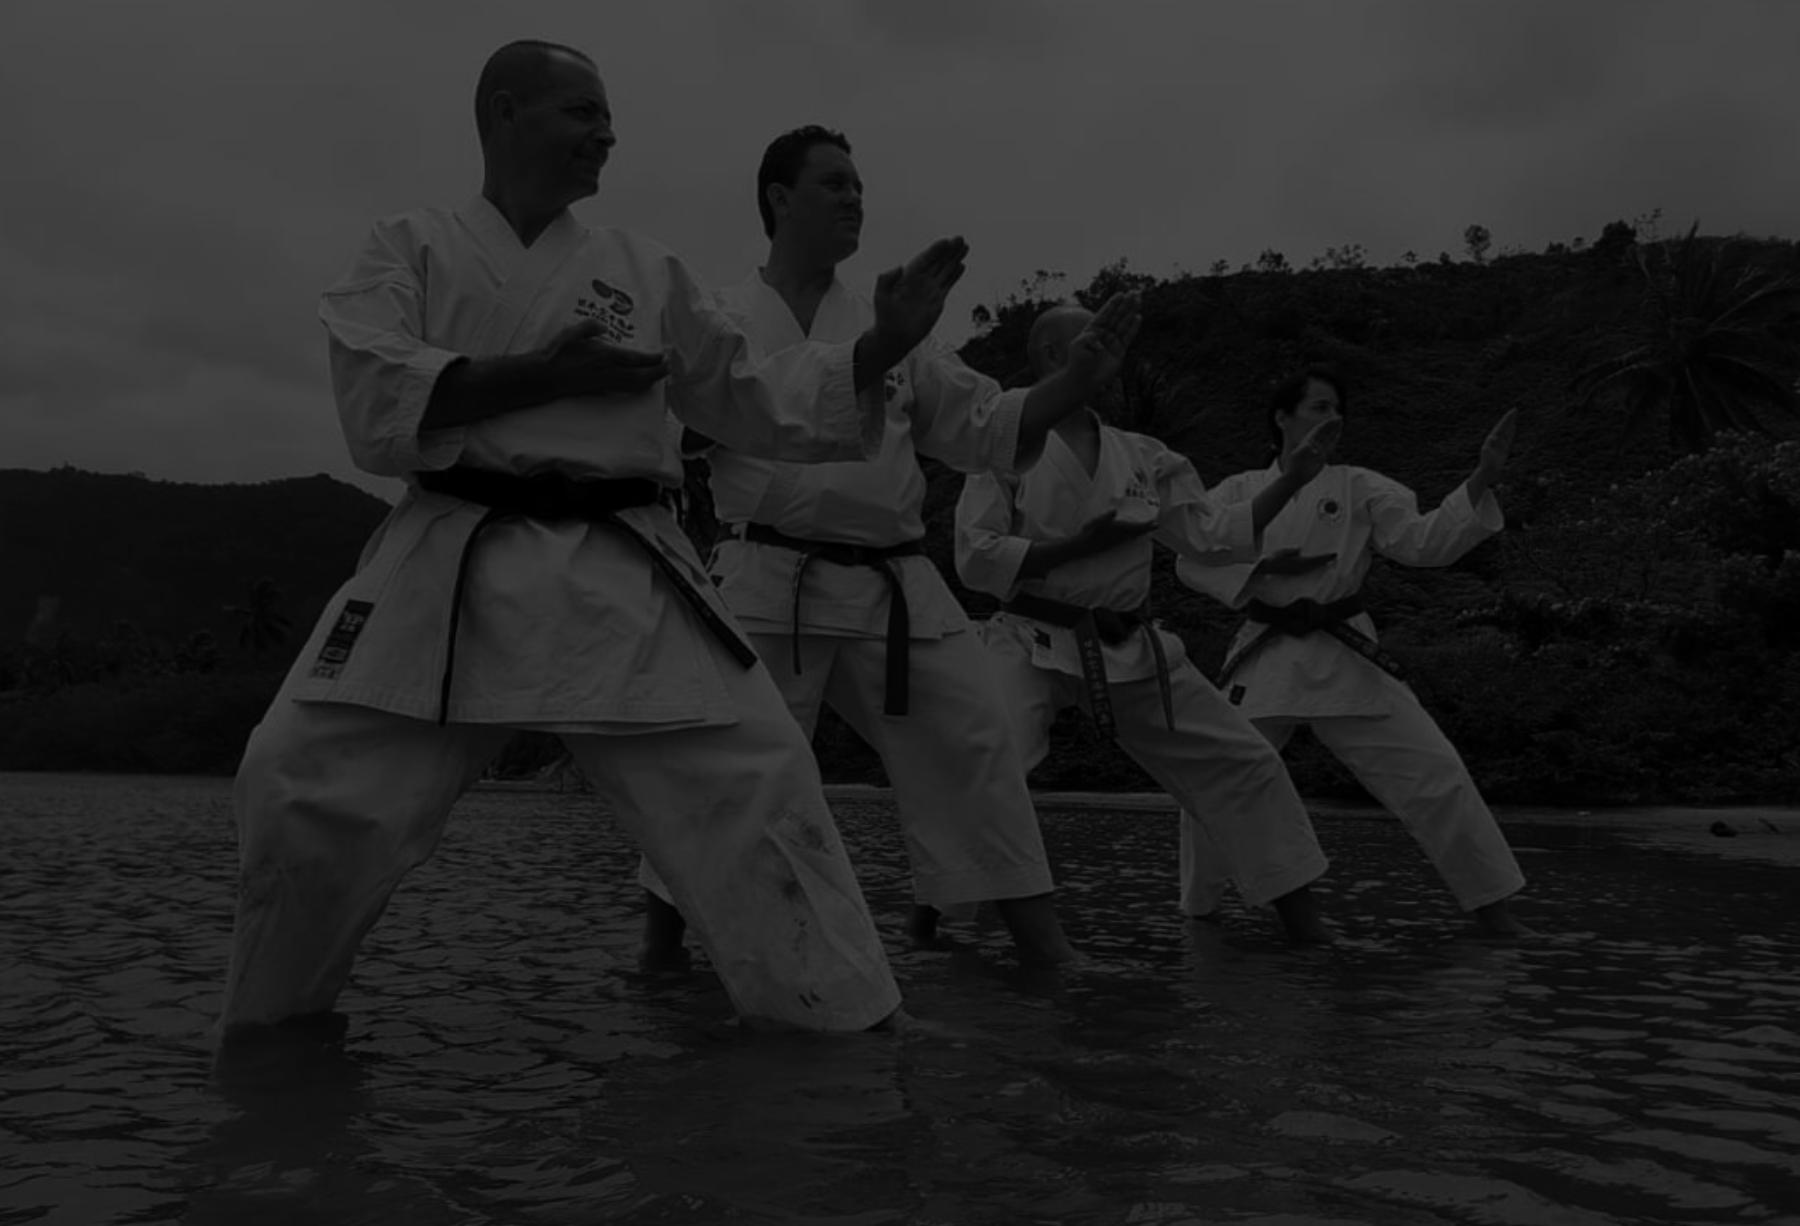 Karate Shotokan - Avançado